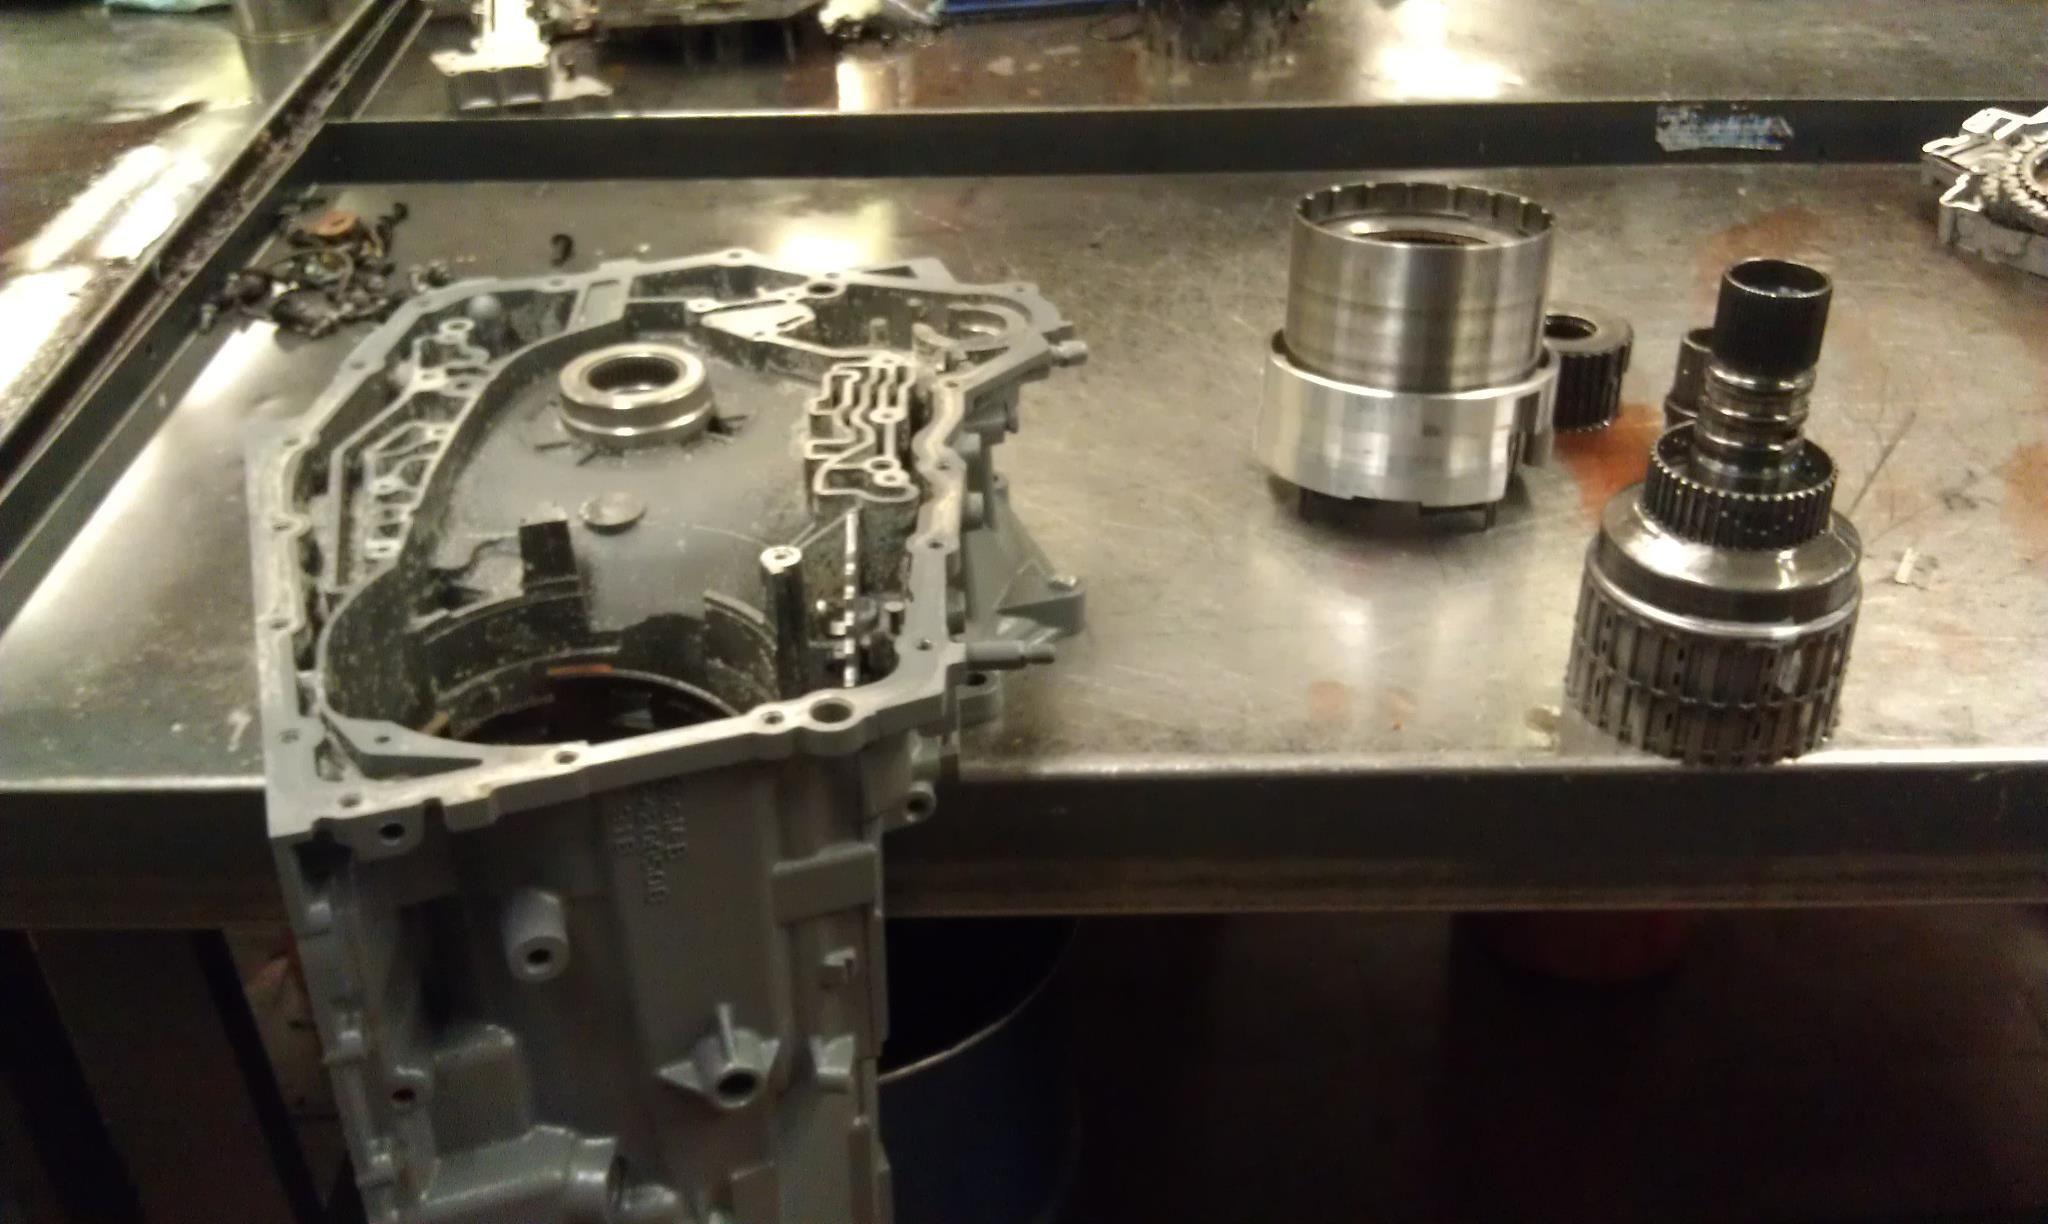 Transmission Repair Shop In Plainfield Il Last Chance Transmission Repair Shop Transmission Repair Repair